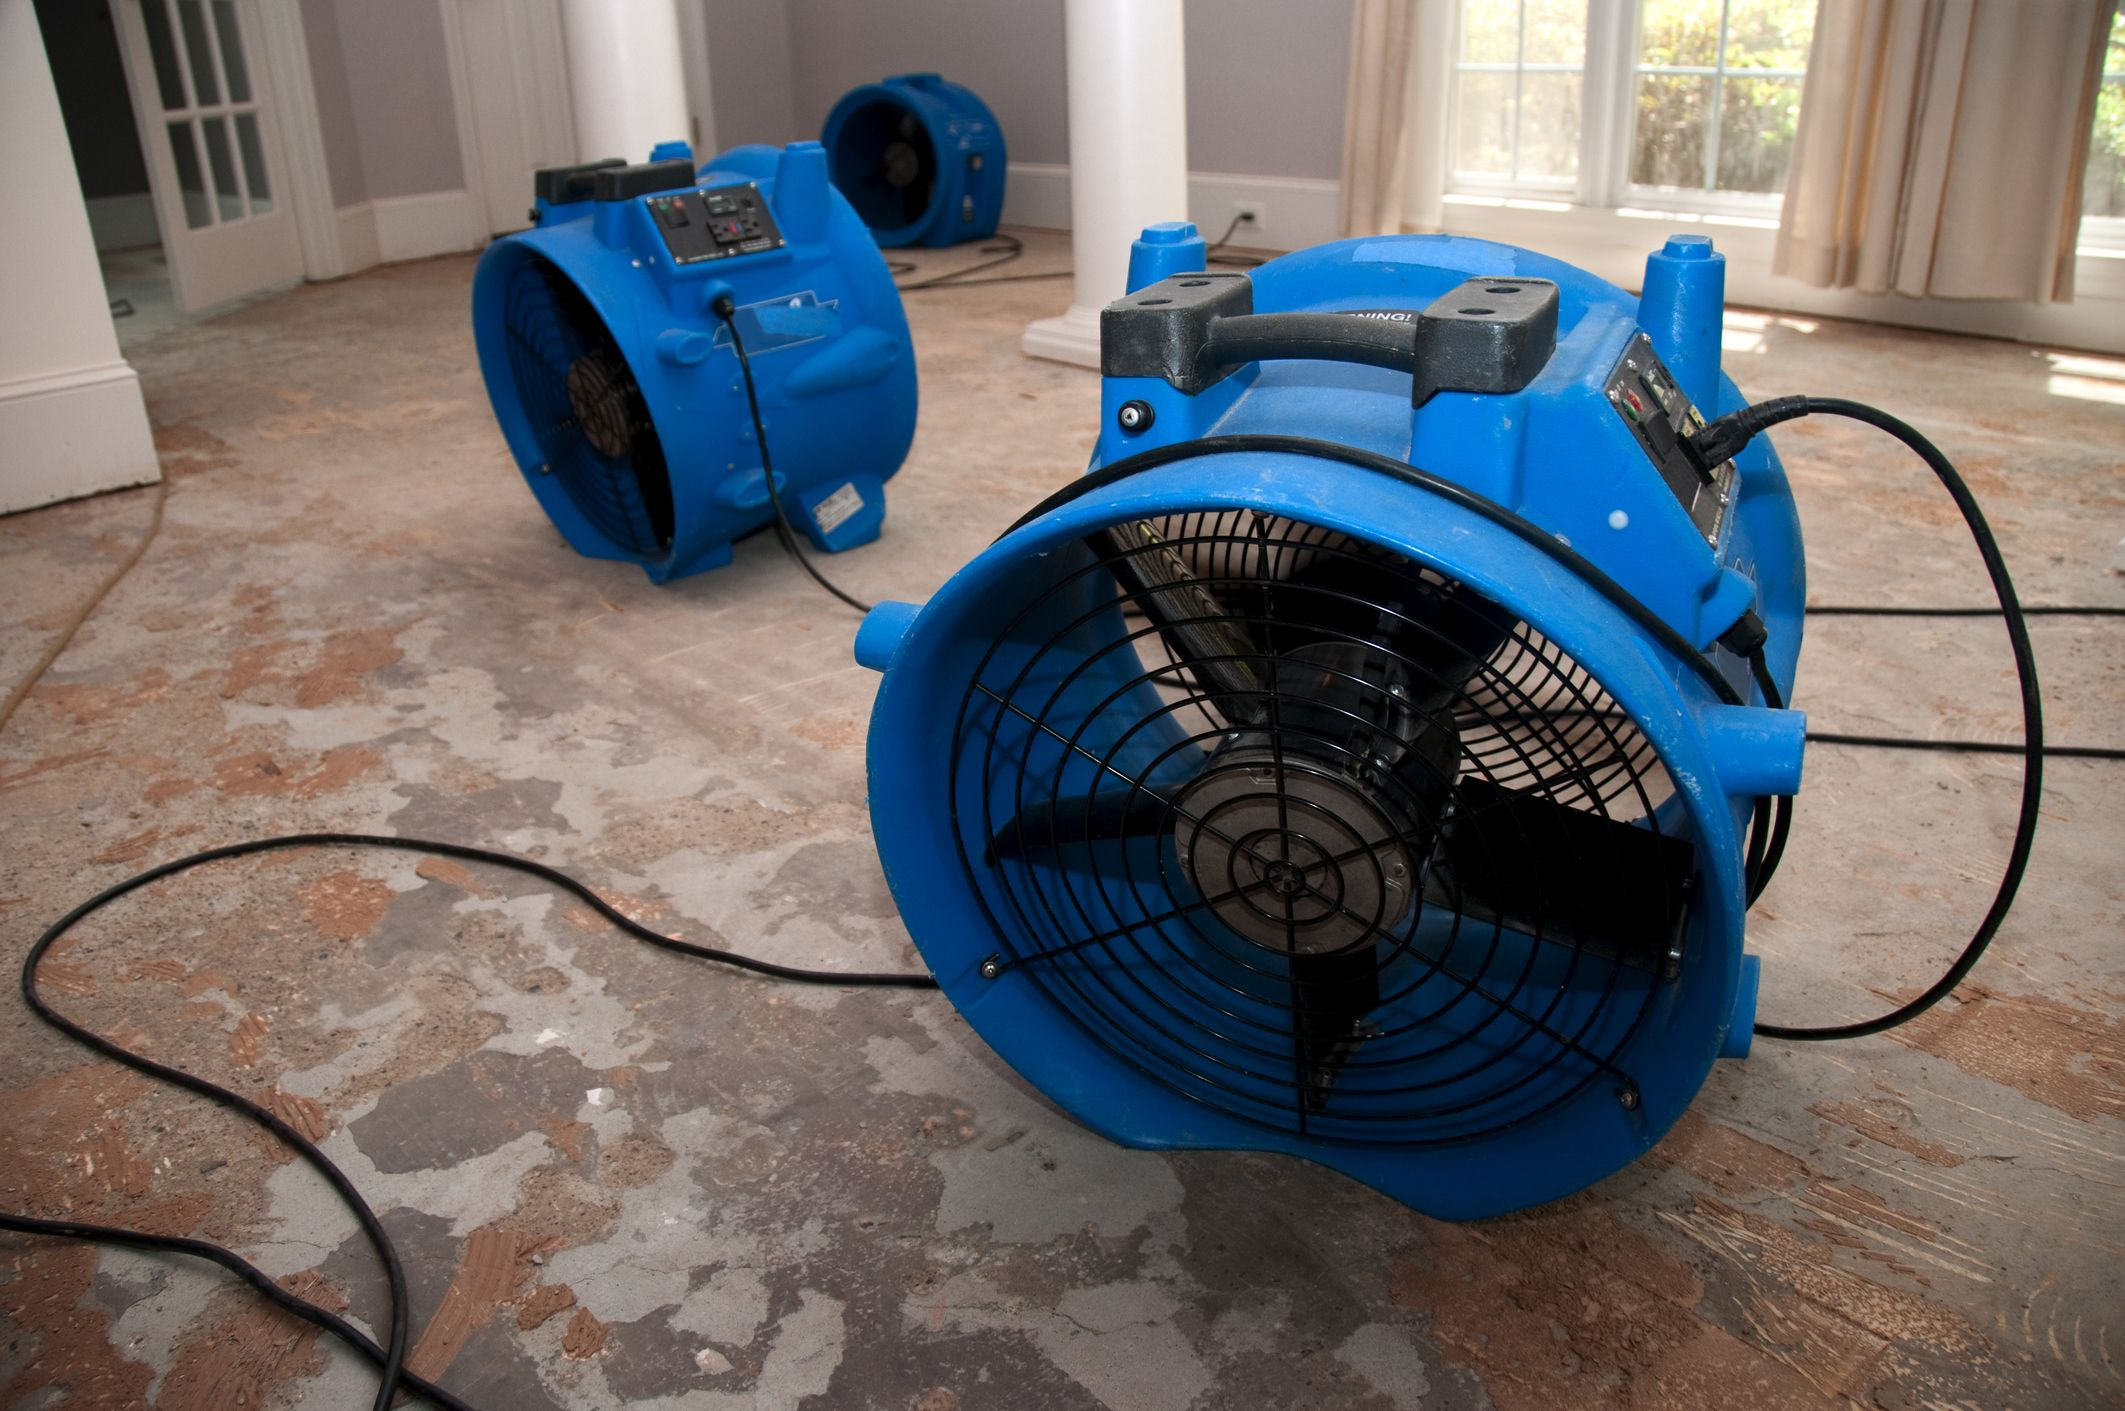 Toronto Water Damage Restoration Equipment In 2020 Damage Restoration Flood Restoration Flooded House